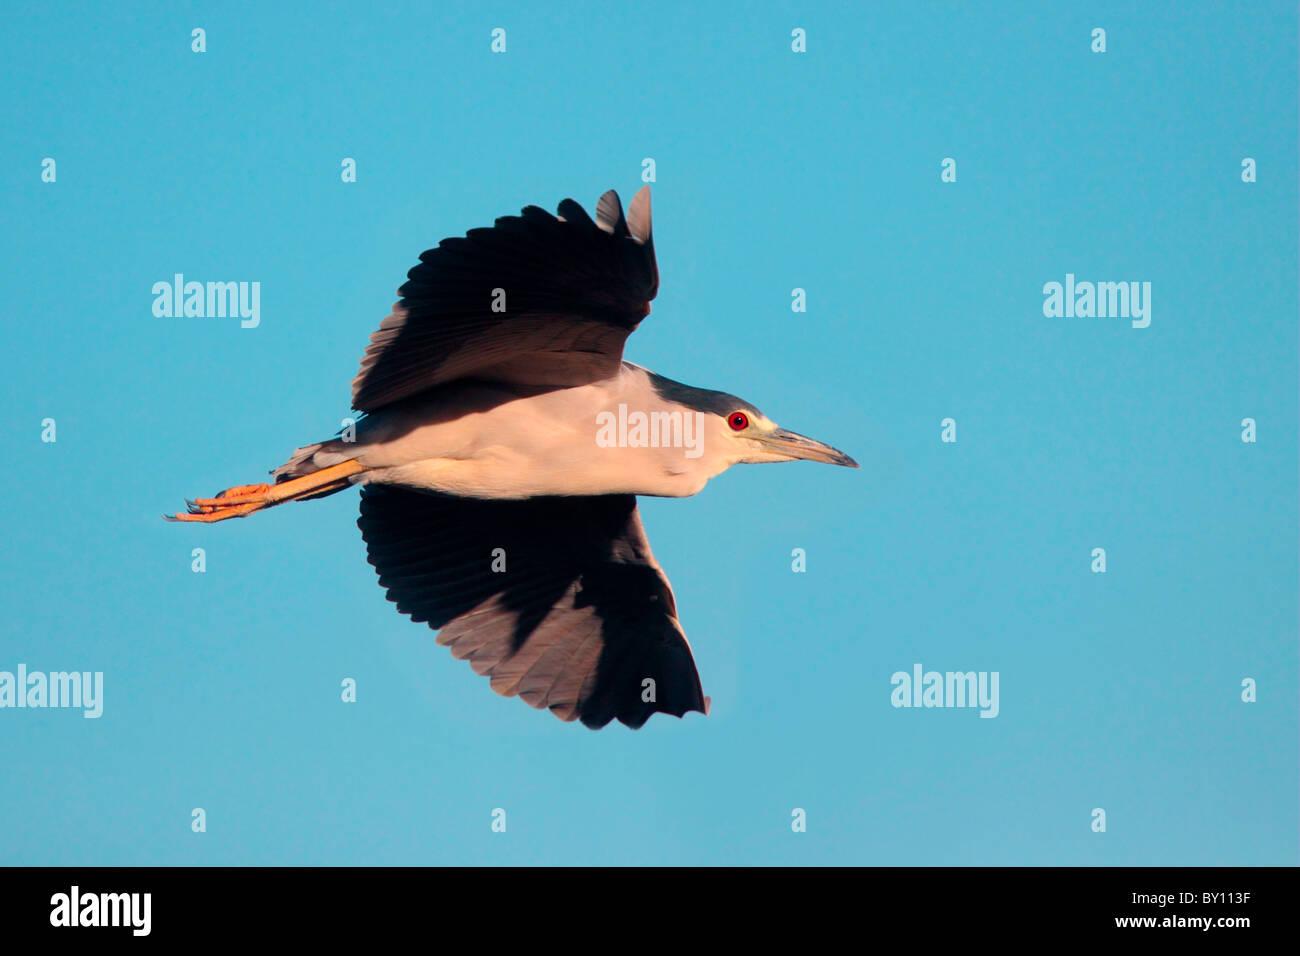 Schwarz-gekrönter Nacht-Reiher im Flug. Stockbild